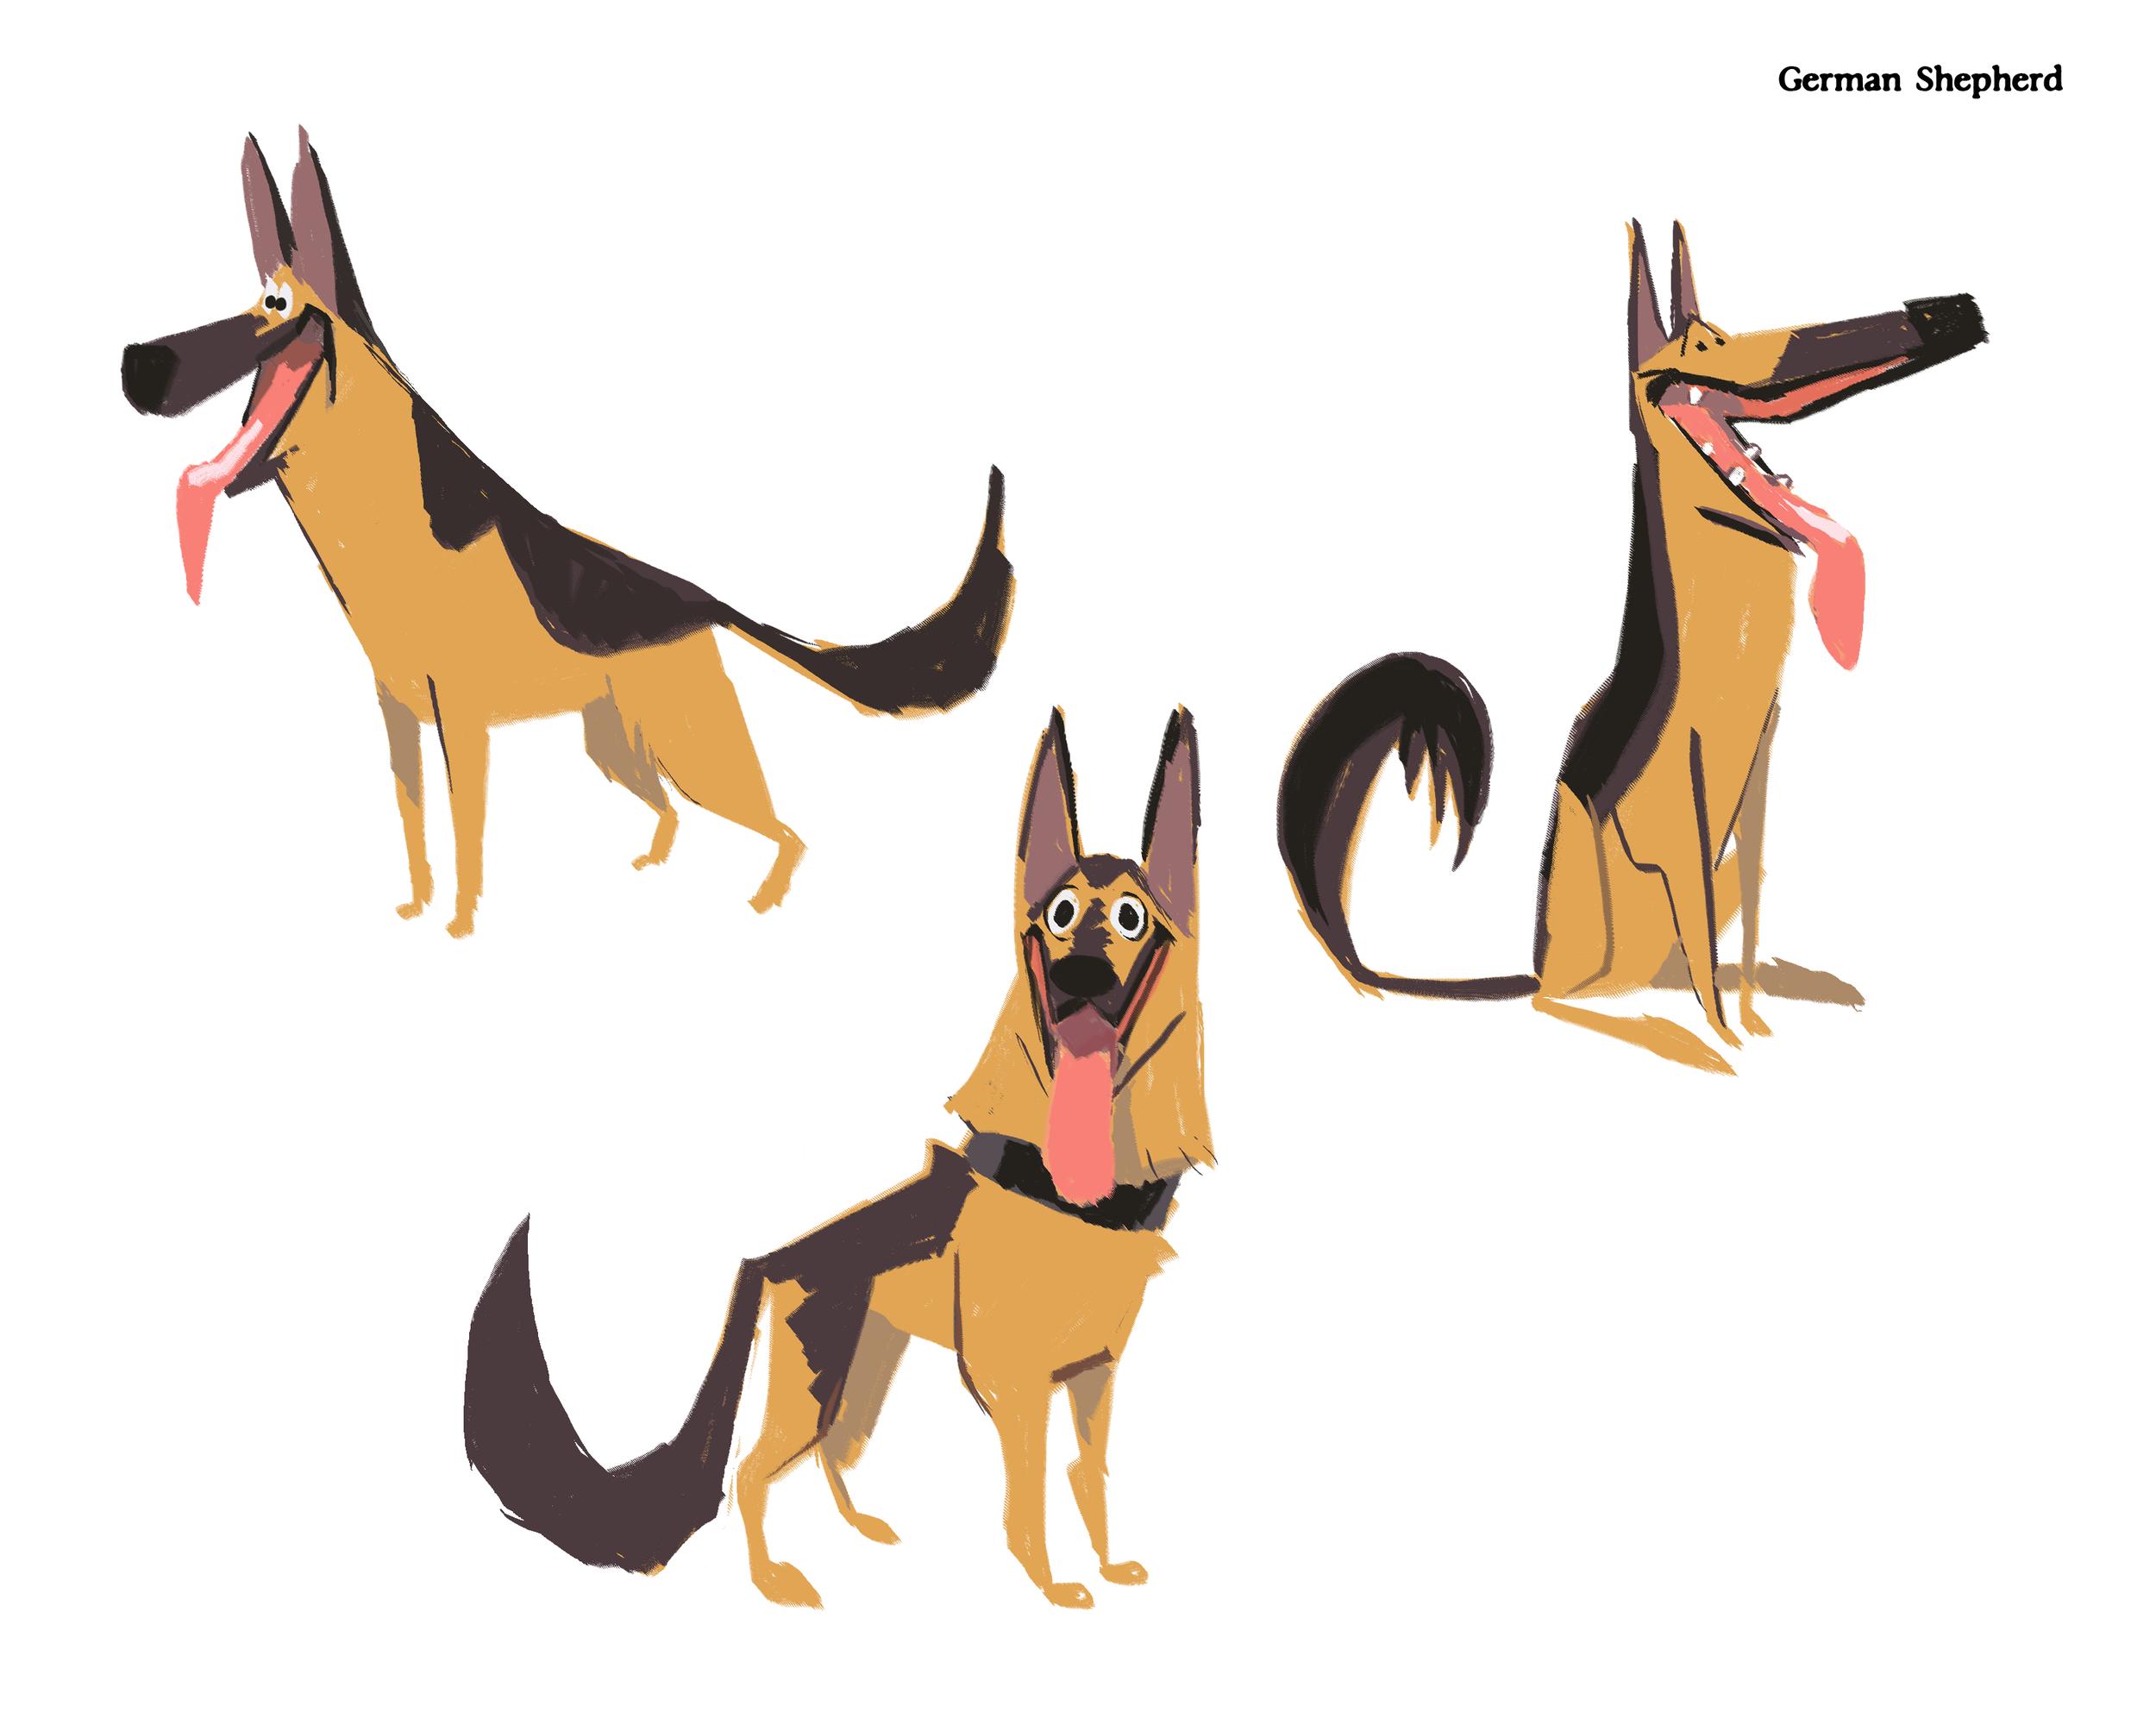 German Shepherd Color Sketches.png